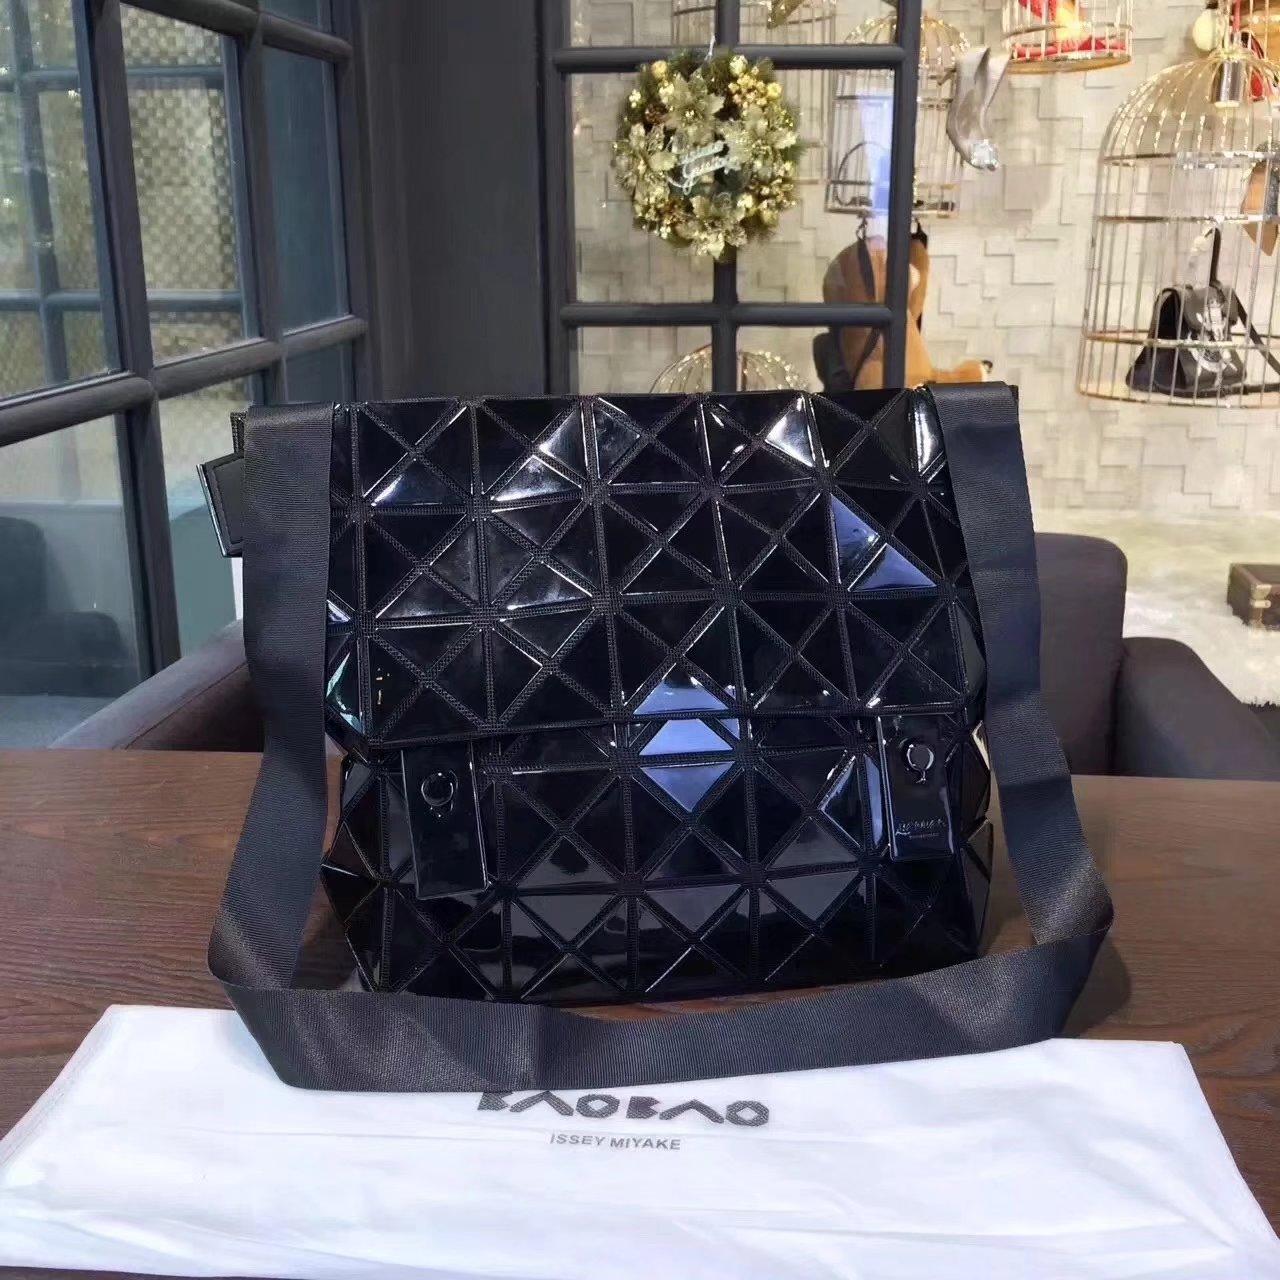 Issey Miyake Bao Bao Shoulder Bag Black